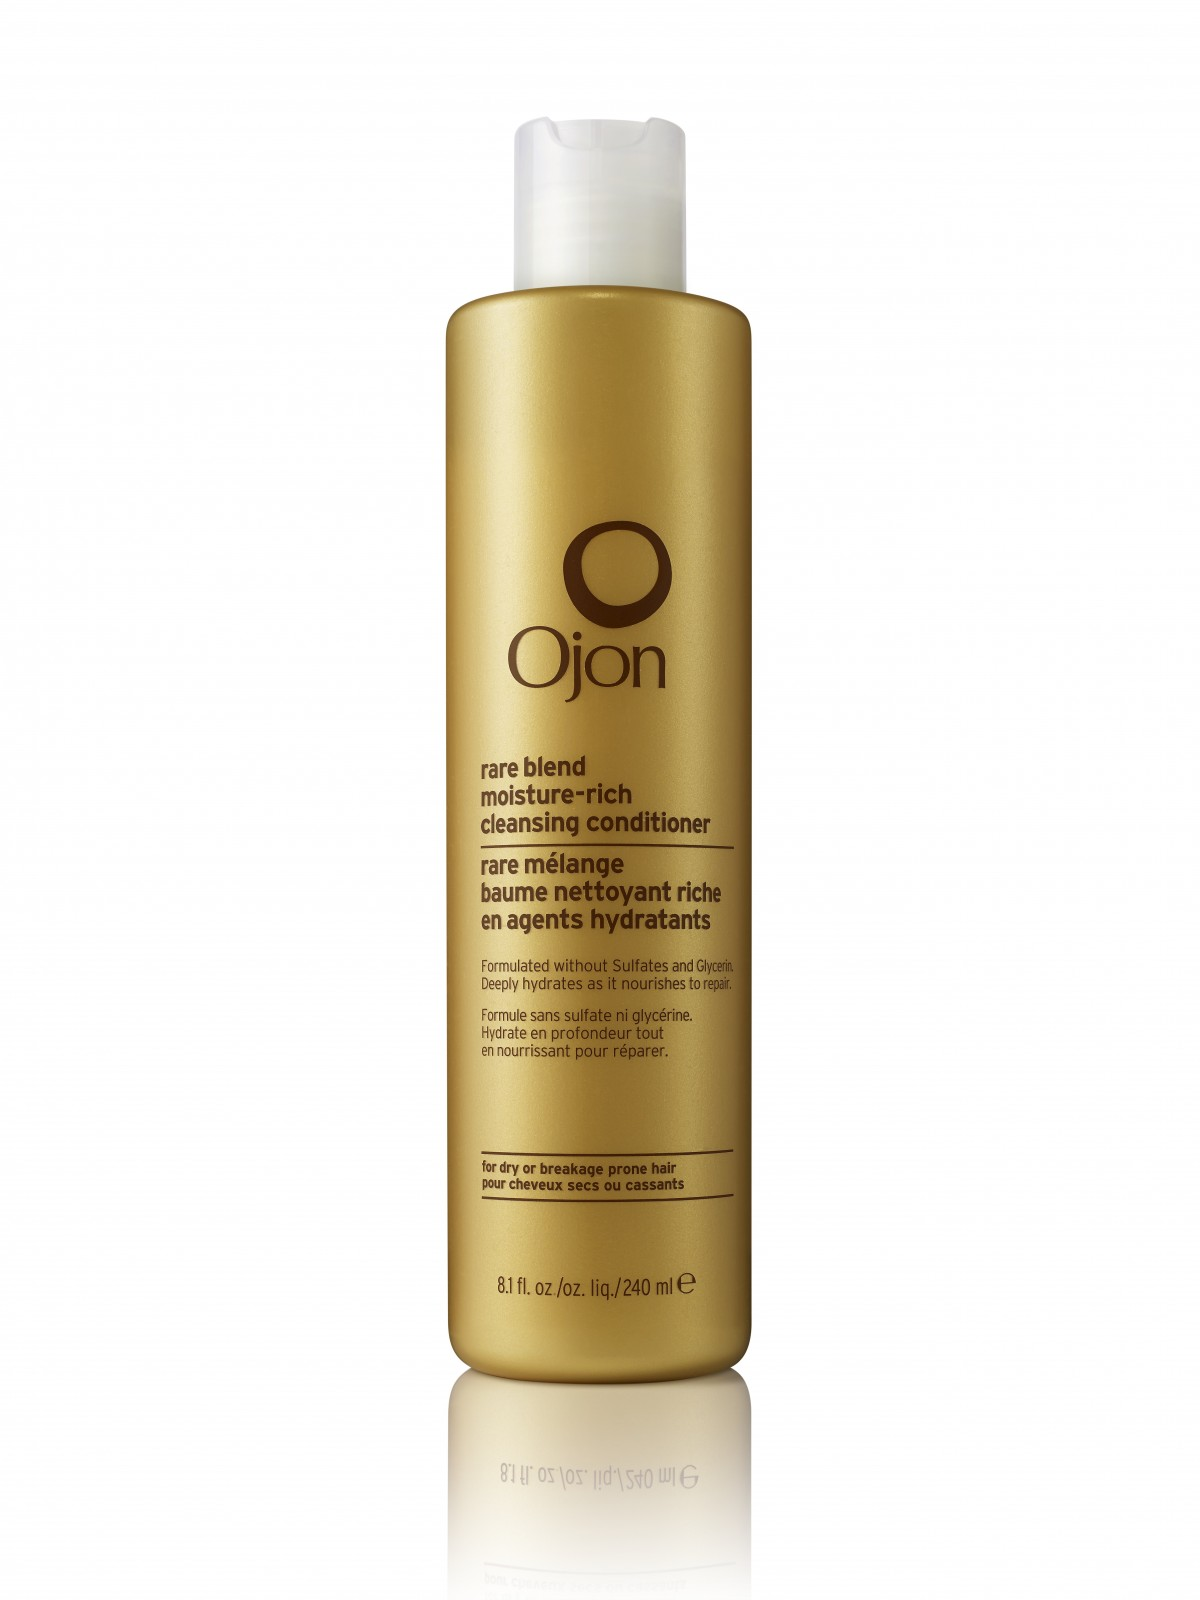 Shampoo vs. Conditioner: Ojon Rare Blend Moisture-rich Cleansing Conditioner